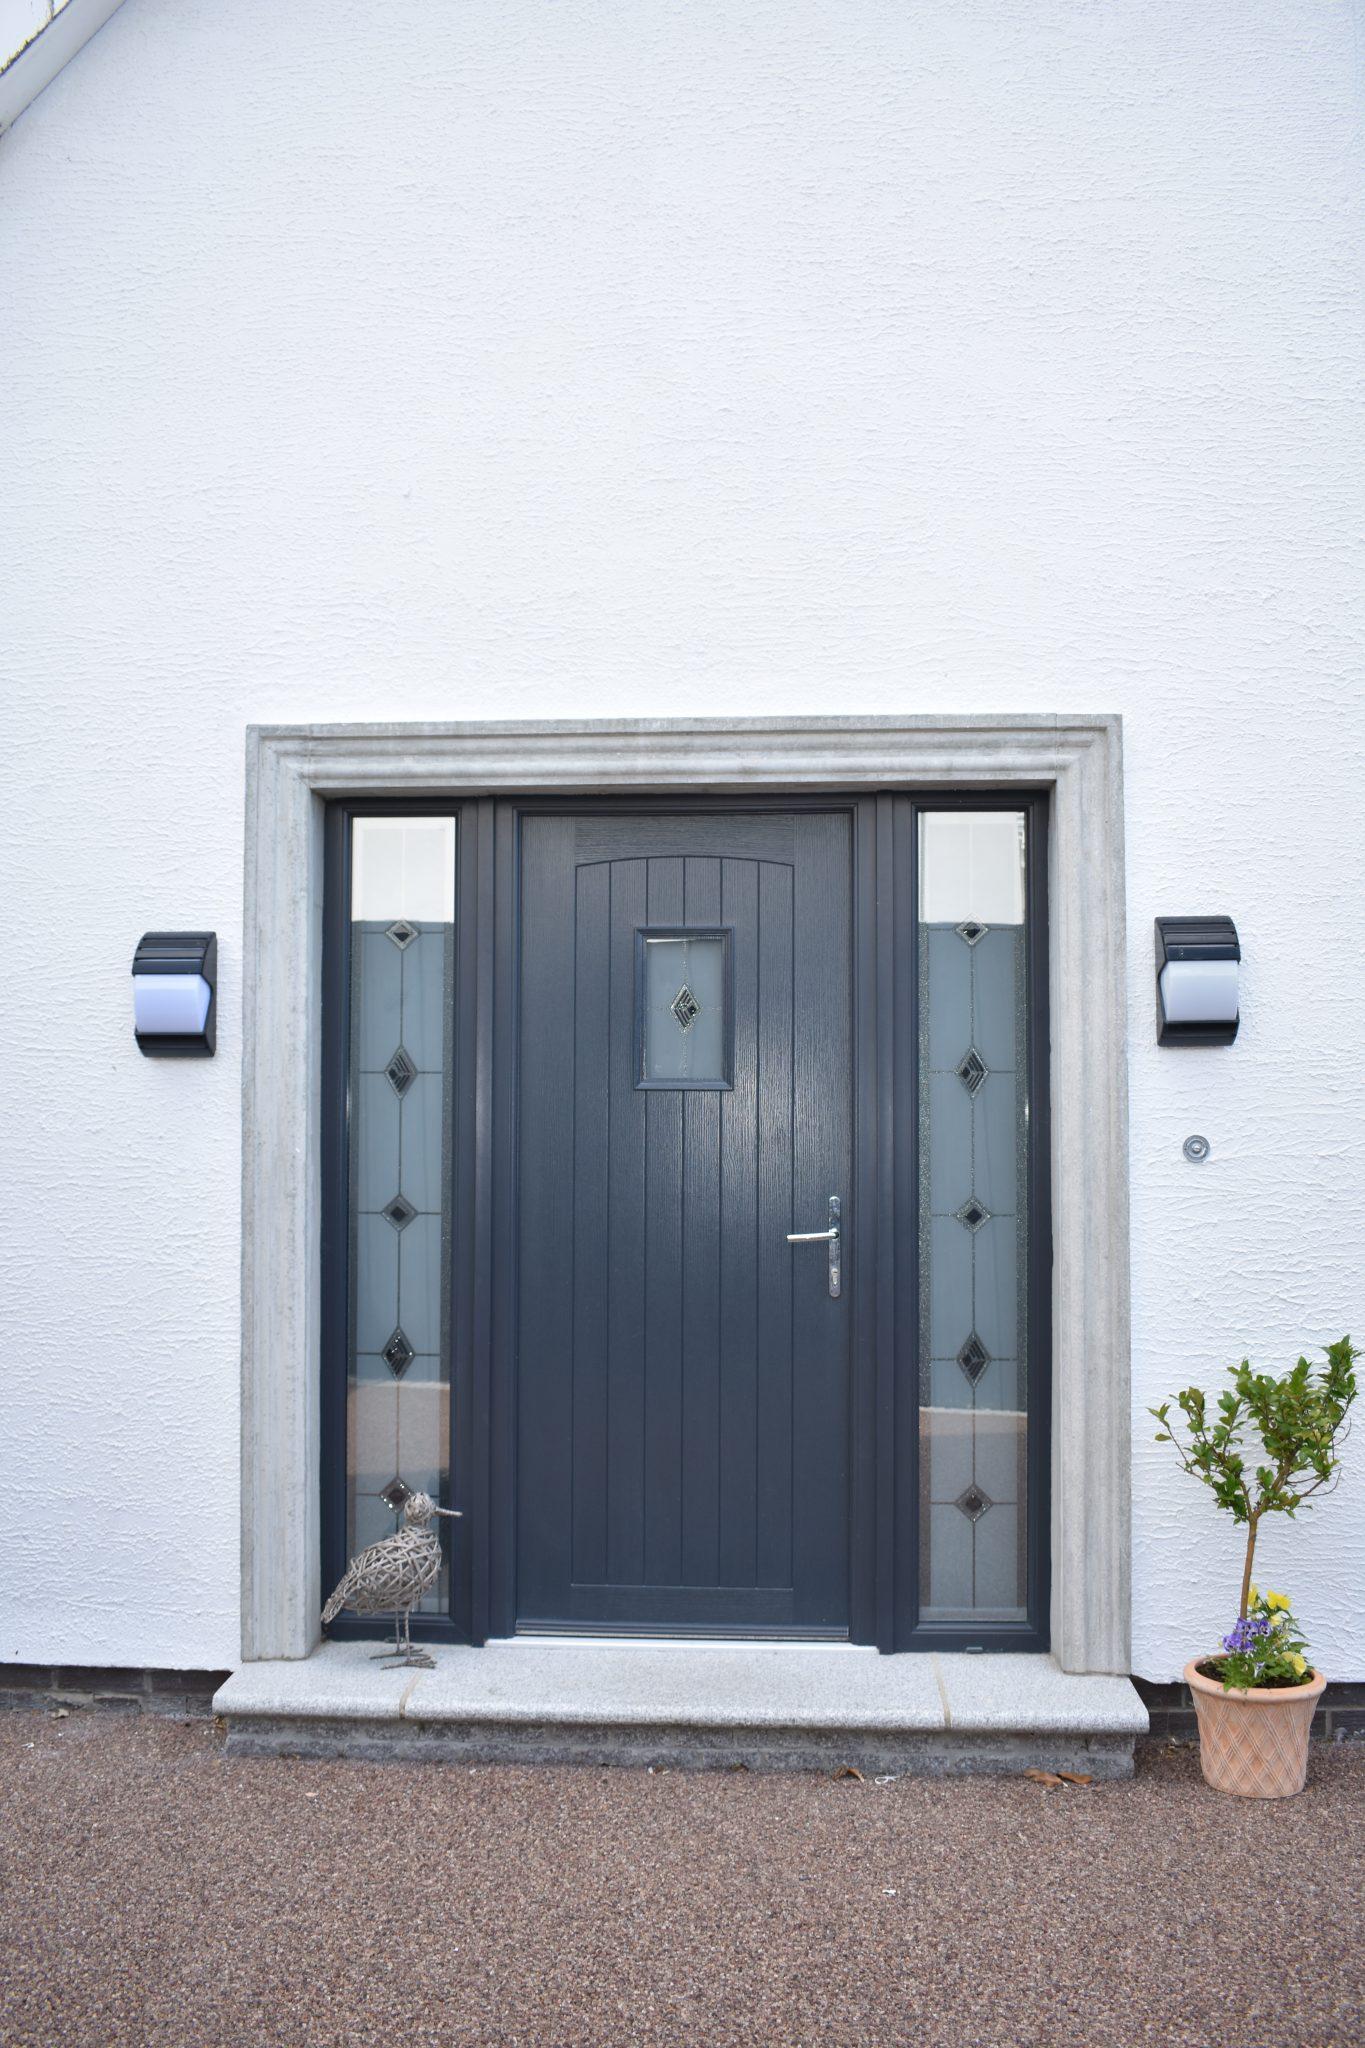 Anthracite grey contemporary composite door